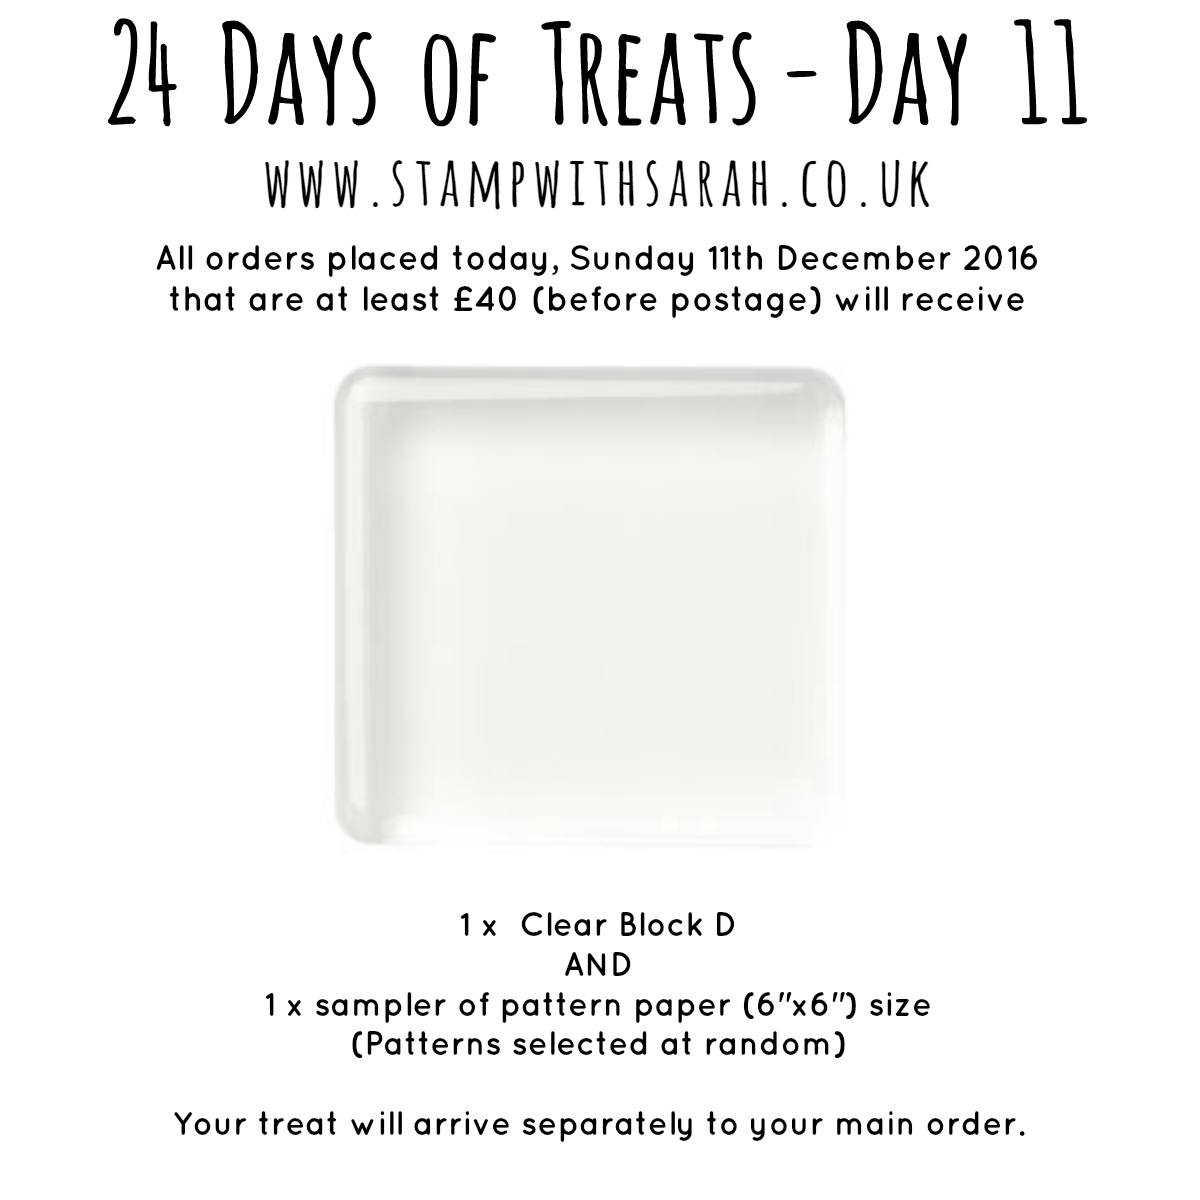 24-days-of-treats-day-11